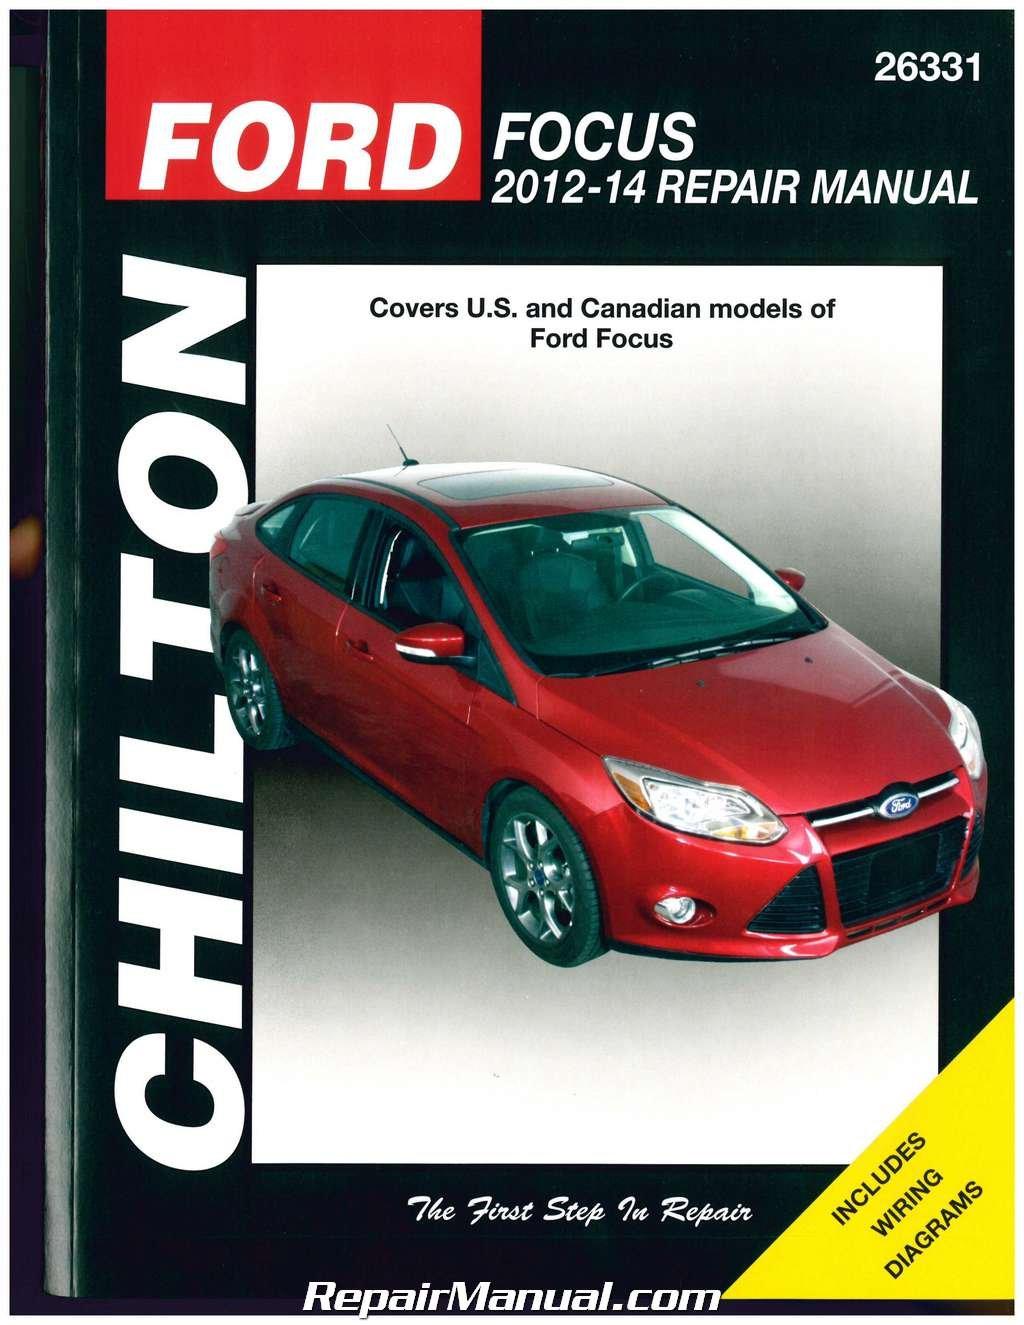 Amazon.com: CH26331 Ford Focus 2012 2013 2014 Chilton Repair Manual:  Automotive